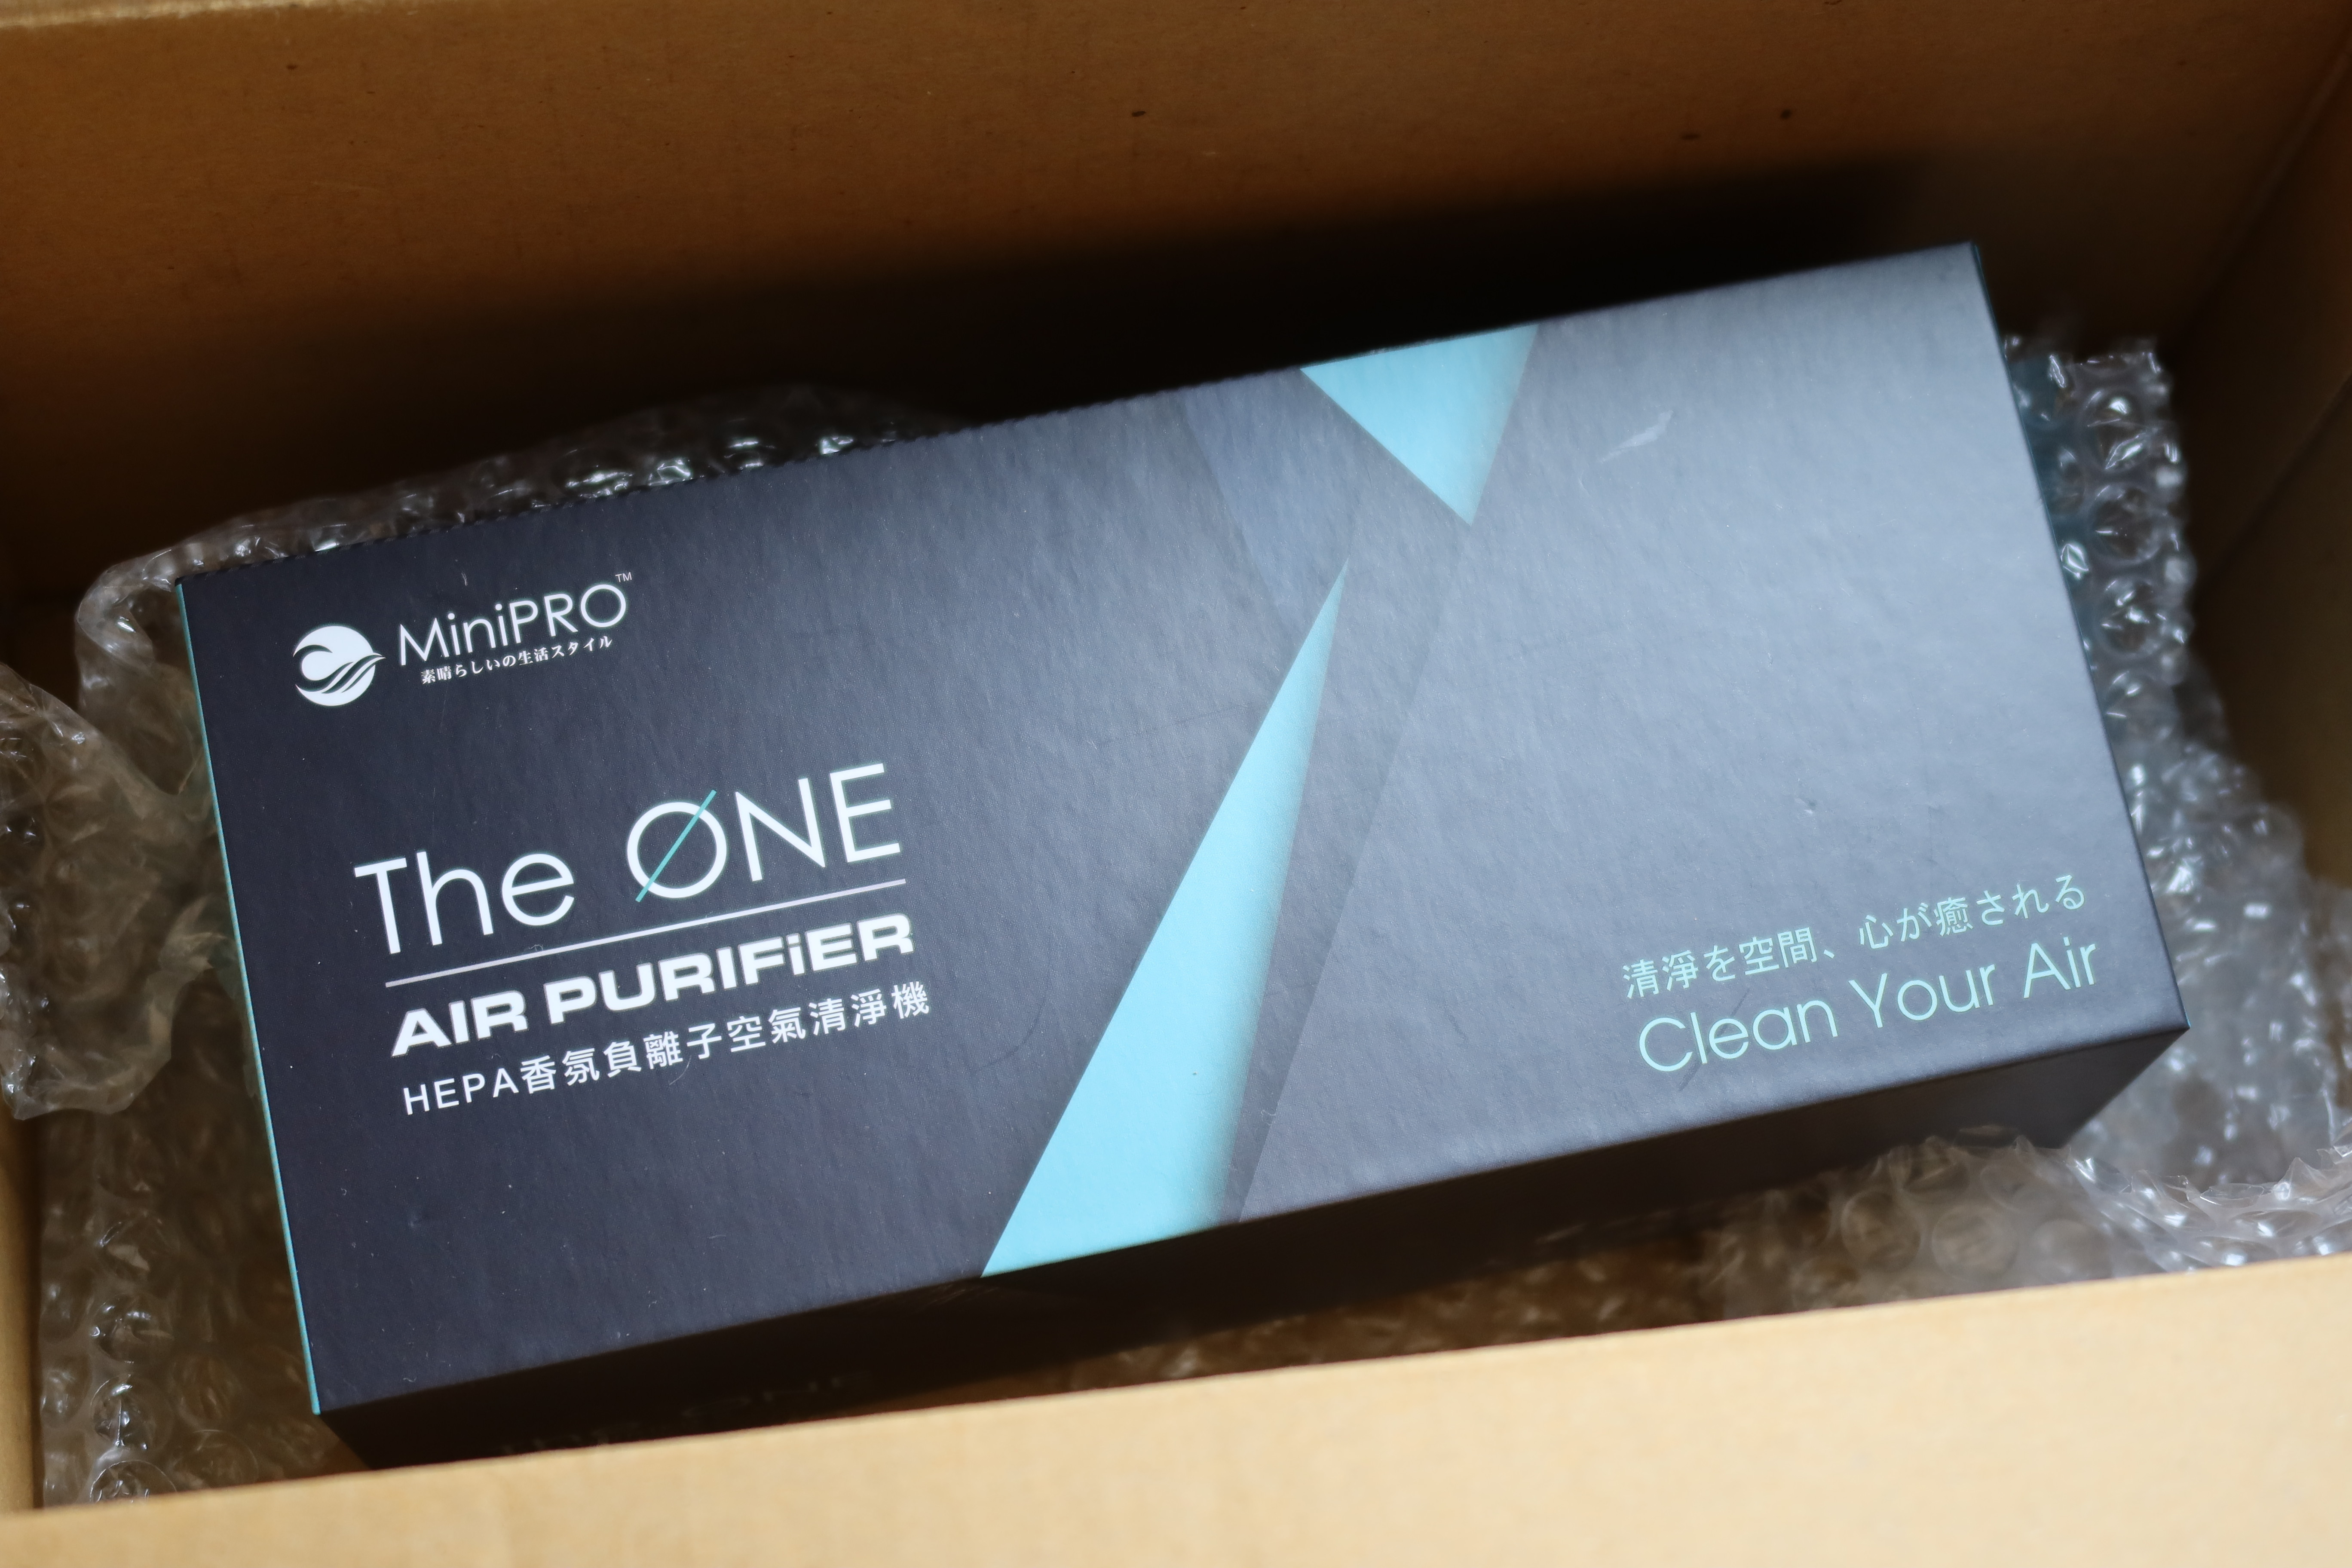 MiniPRO微型電氣大師│HEPA香氛負離子空氣清淨機MP-A3688【首創香氛功能,同時淨化空氣又能輕鬆享受香氛】HEPA高效淨化濾網、低噪音,USB供電隨身攜帶超便利│小空間空氣清淨機推薦